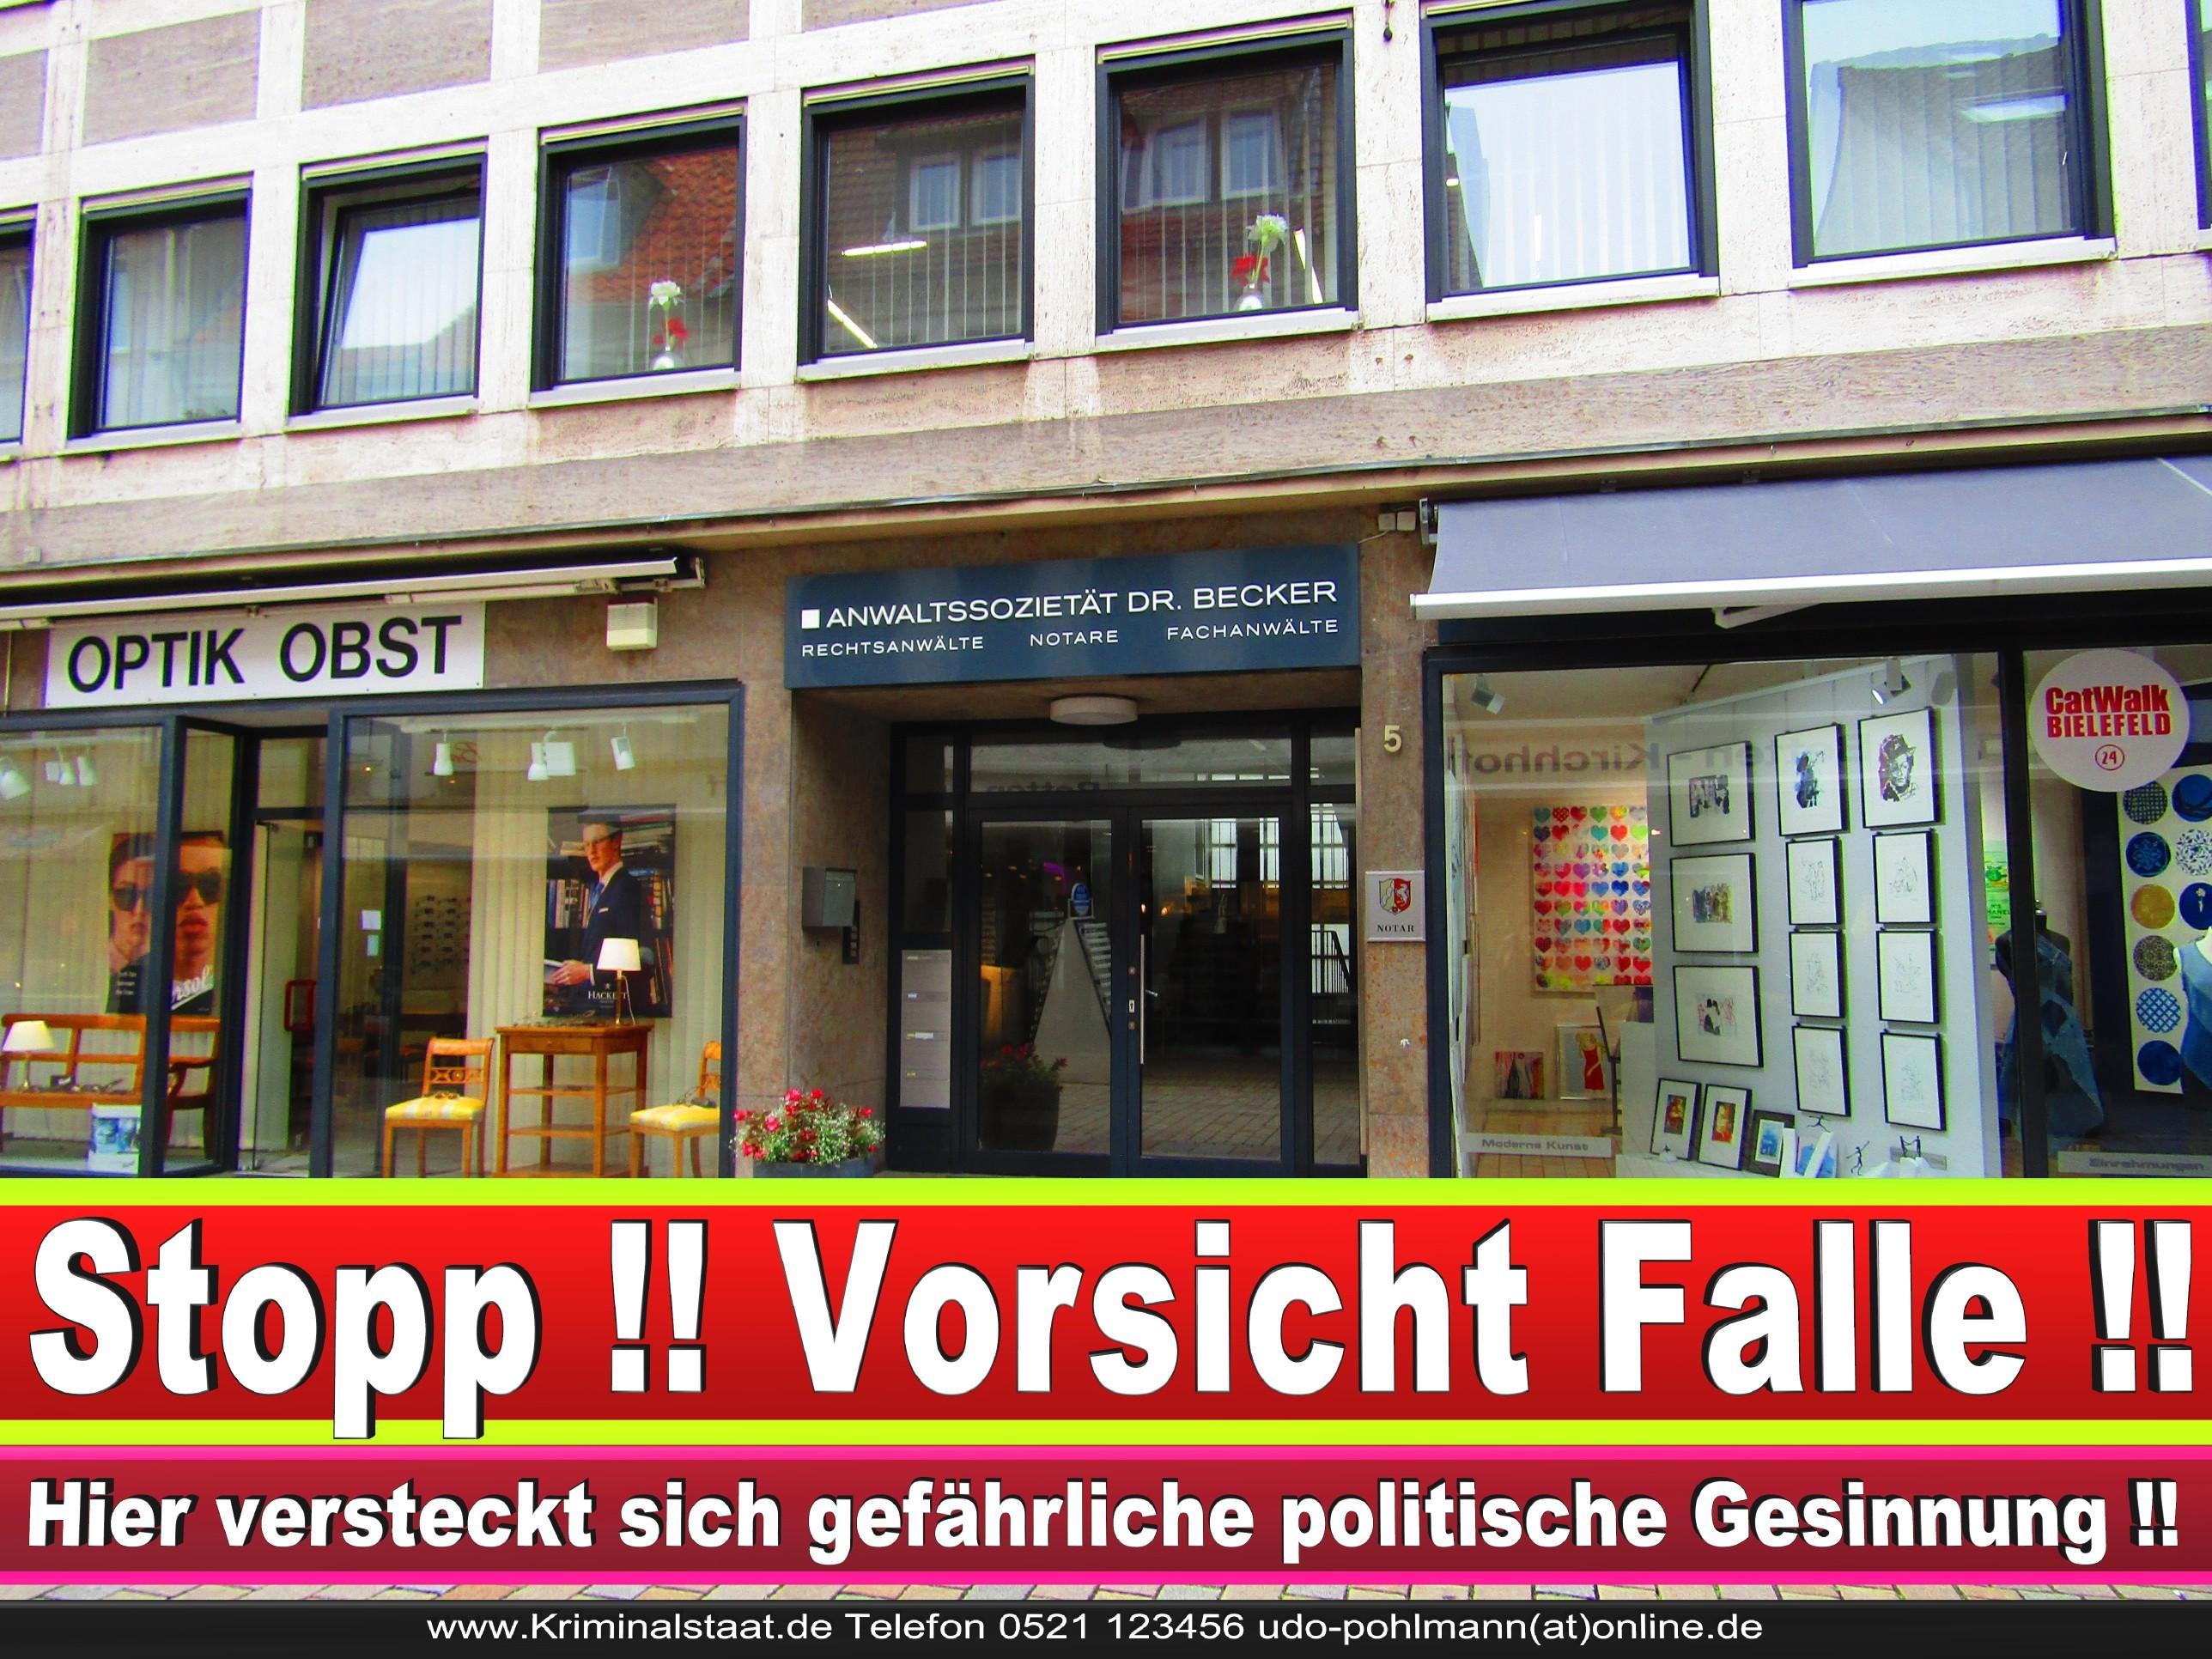 RECHTSANWALT DR THORSTEN FELDMANN CDU BIELEFELD Rechtsanwalt Und Notar A D Werner Kaup 2 LANDTAGSWAHL BUNDESTAGSWAHL BÜRGERMEISTERWAHL